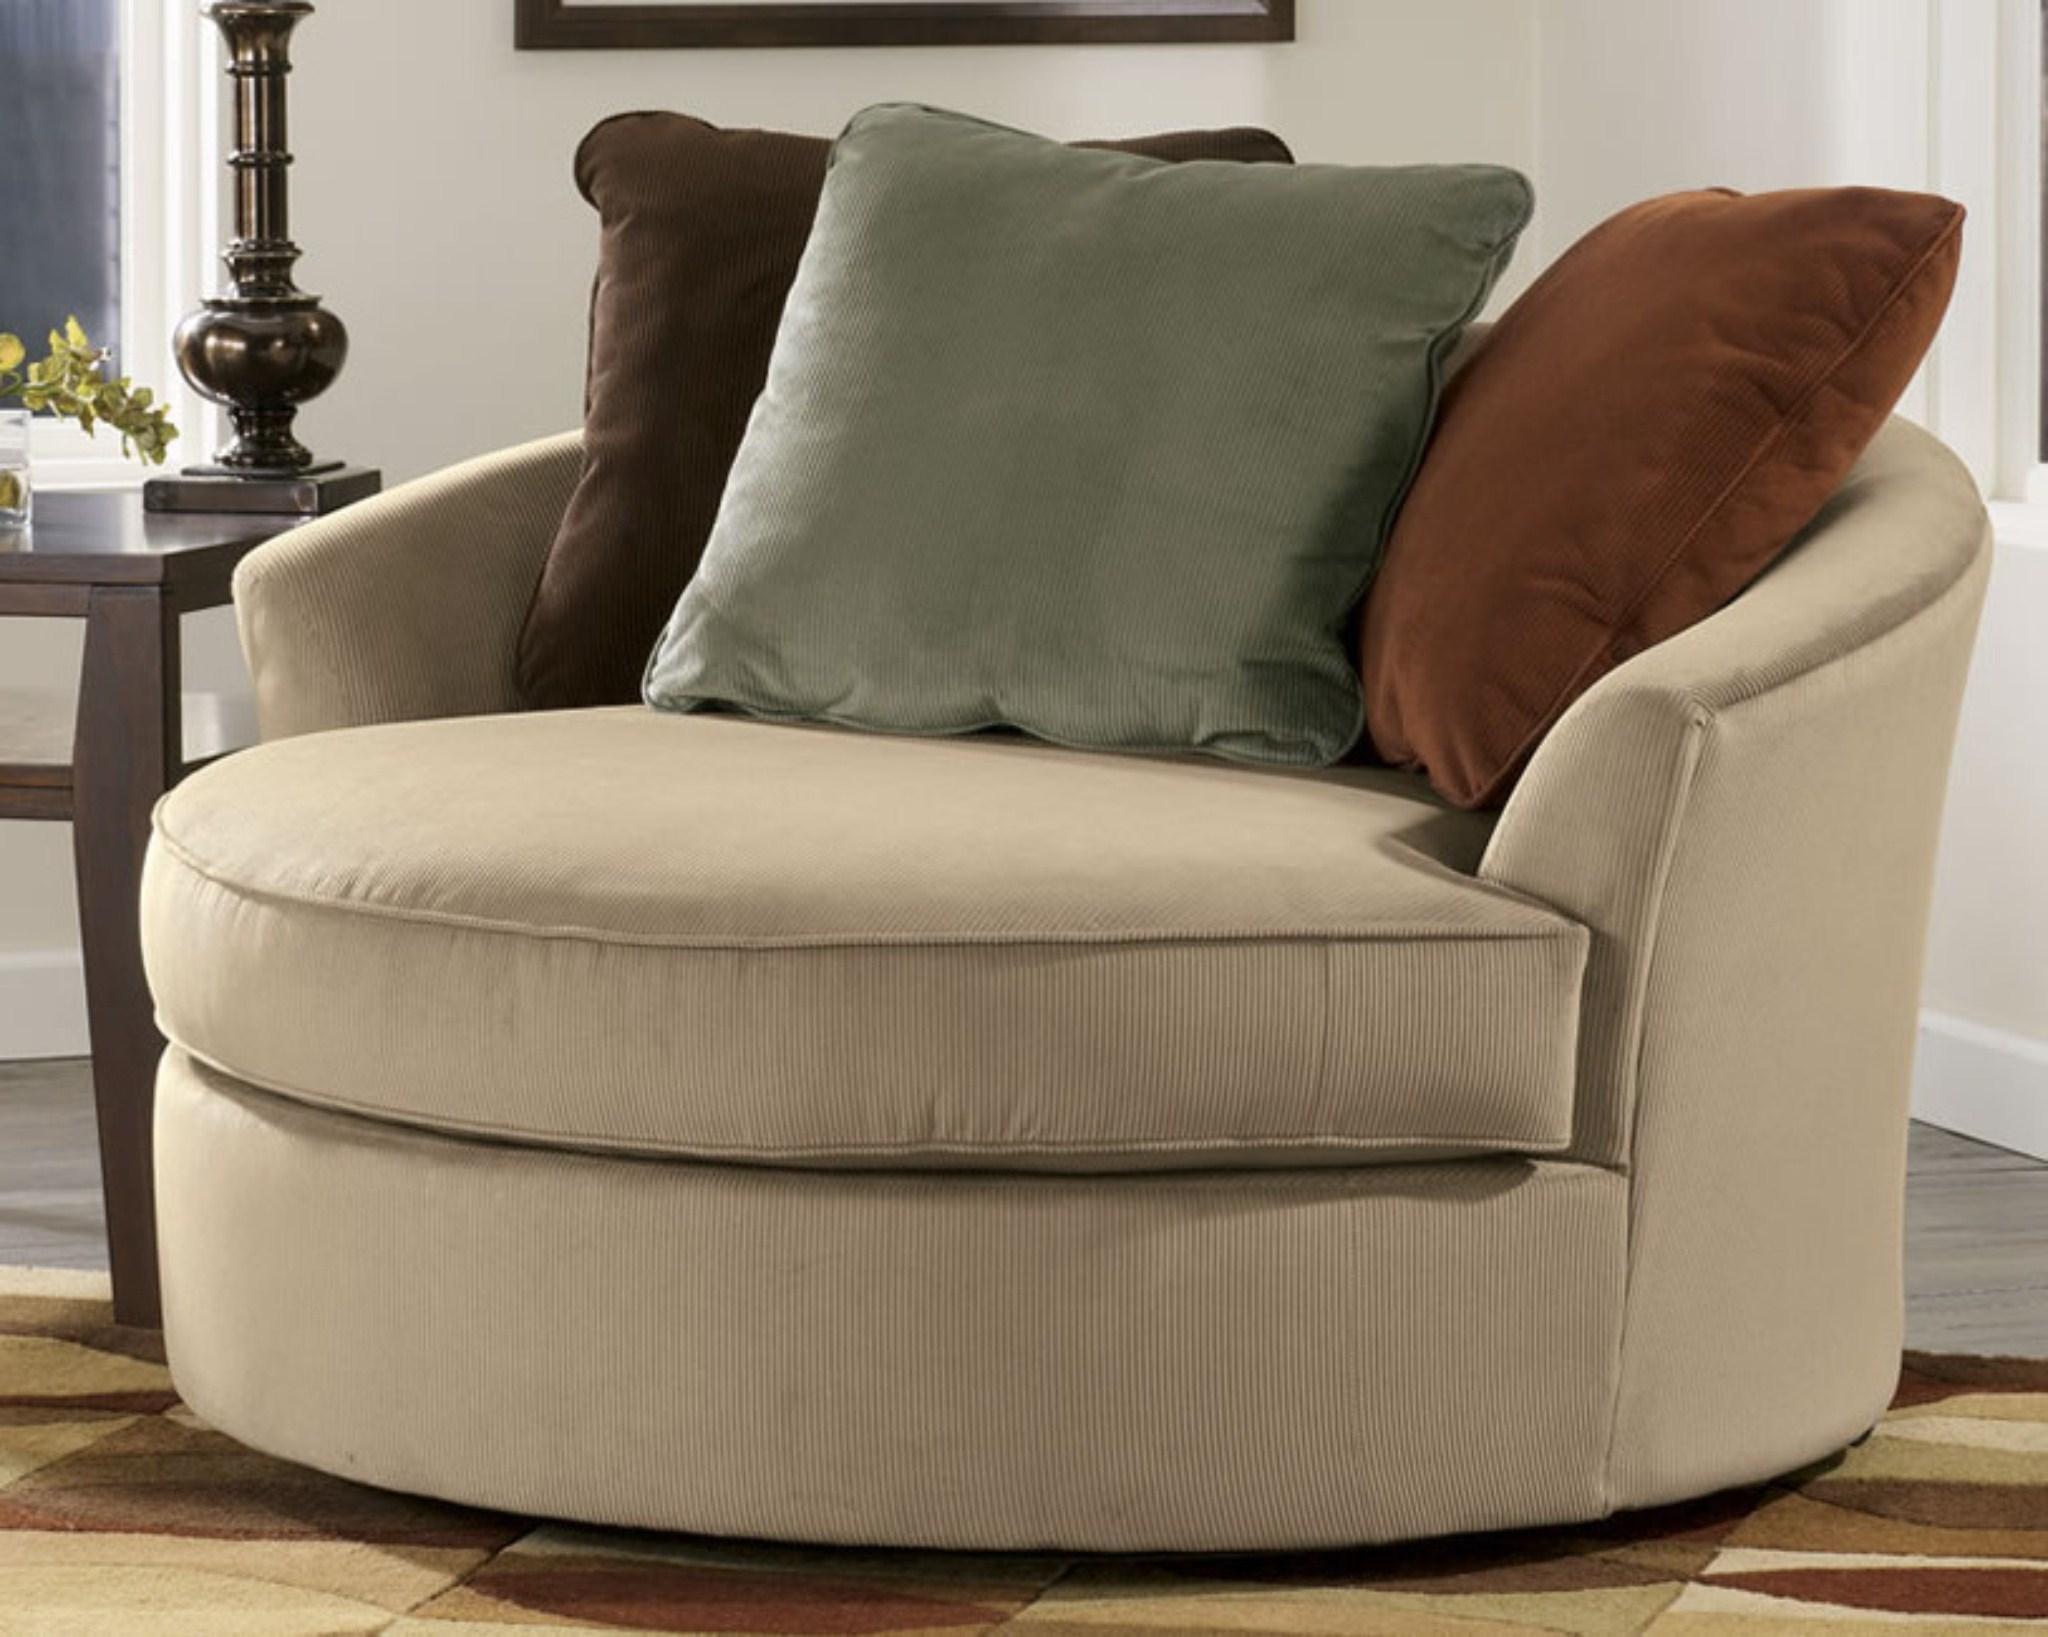 round sofa chair intex float 20 best ideas living room furniture